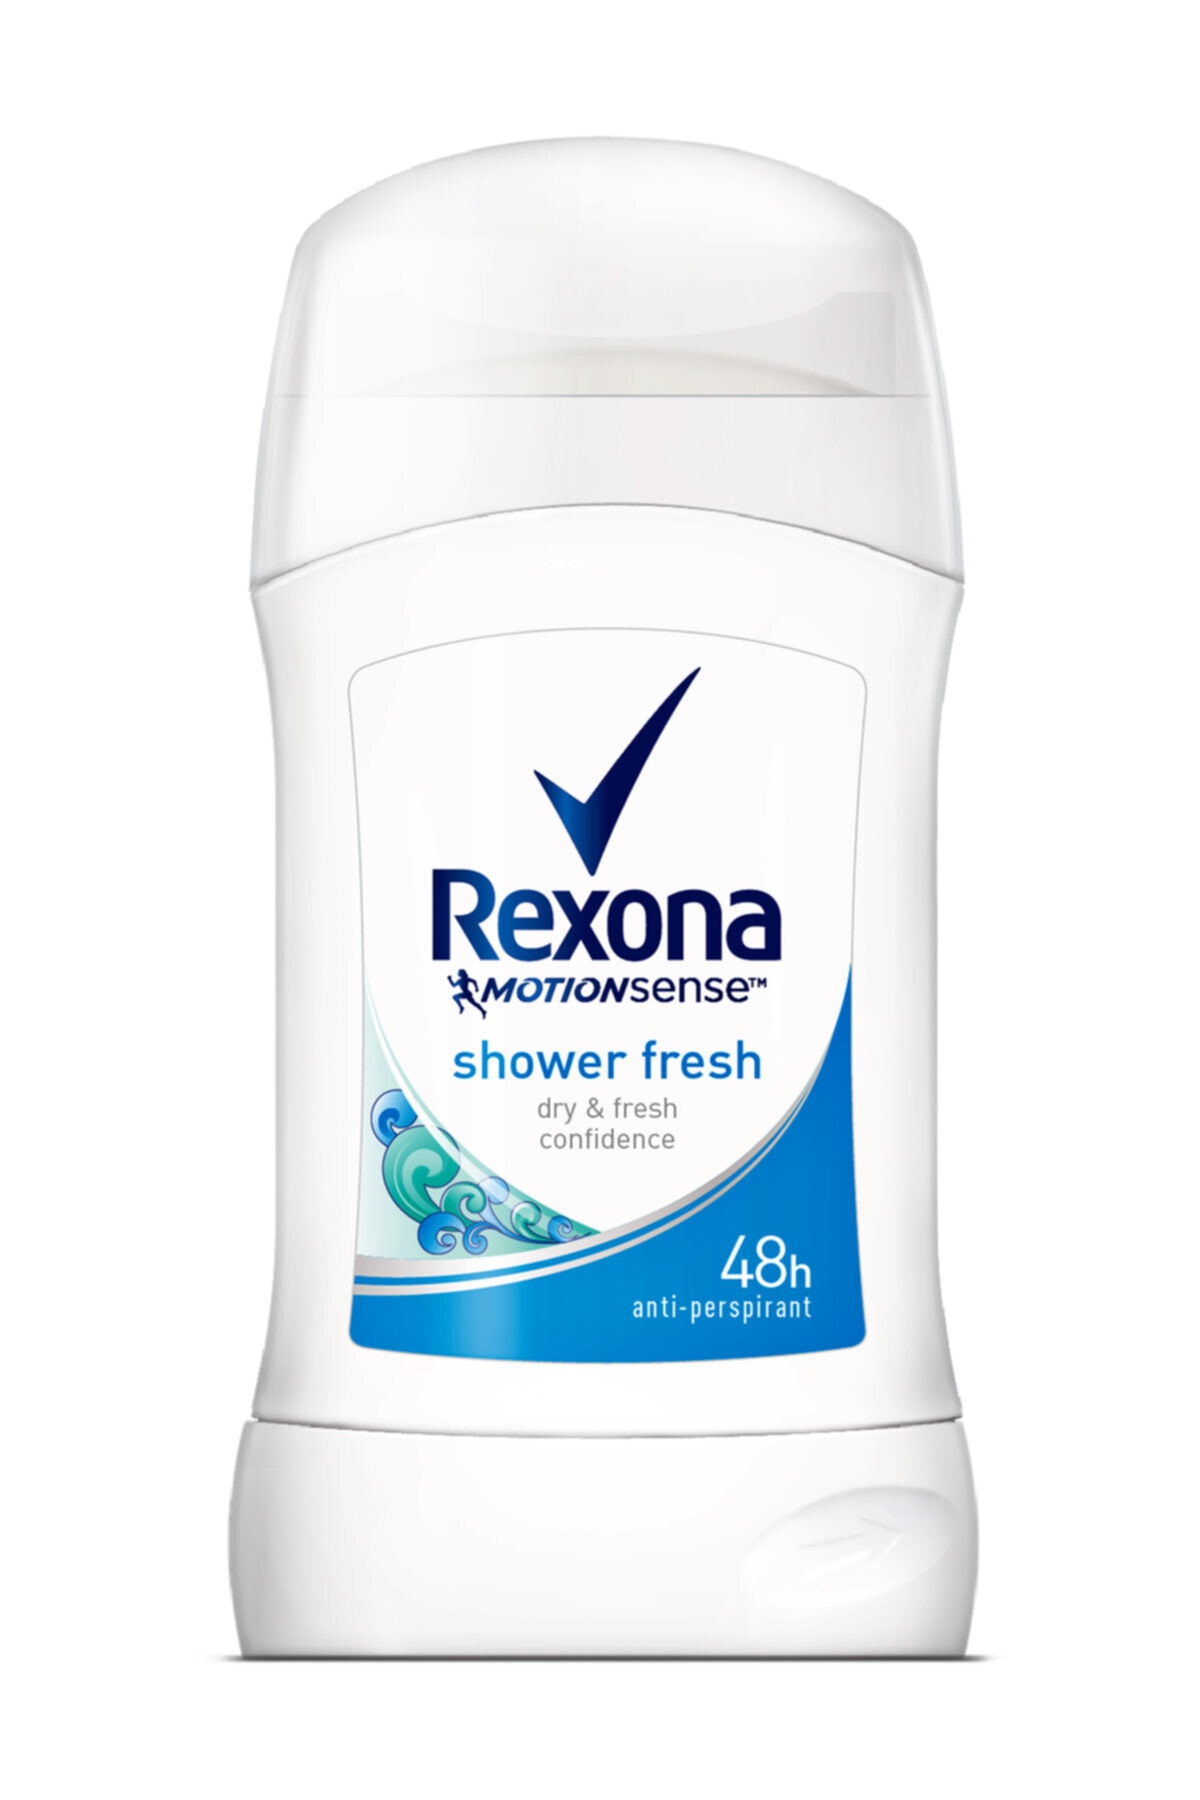 Rexona Shower Fresh Anti-perspirant 48h Deodorant Stick 50 G 1